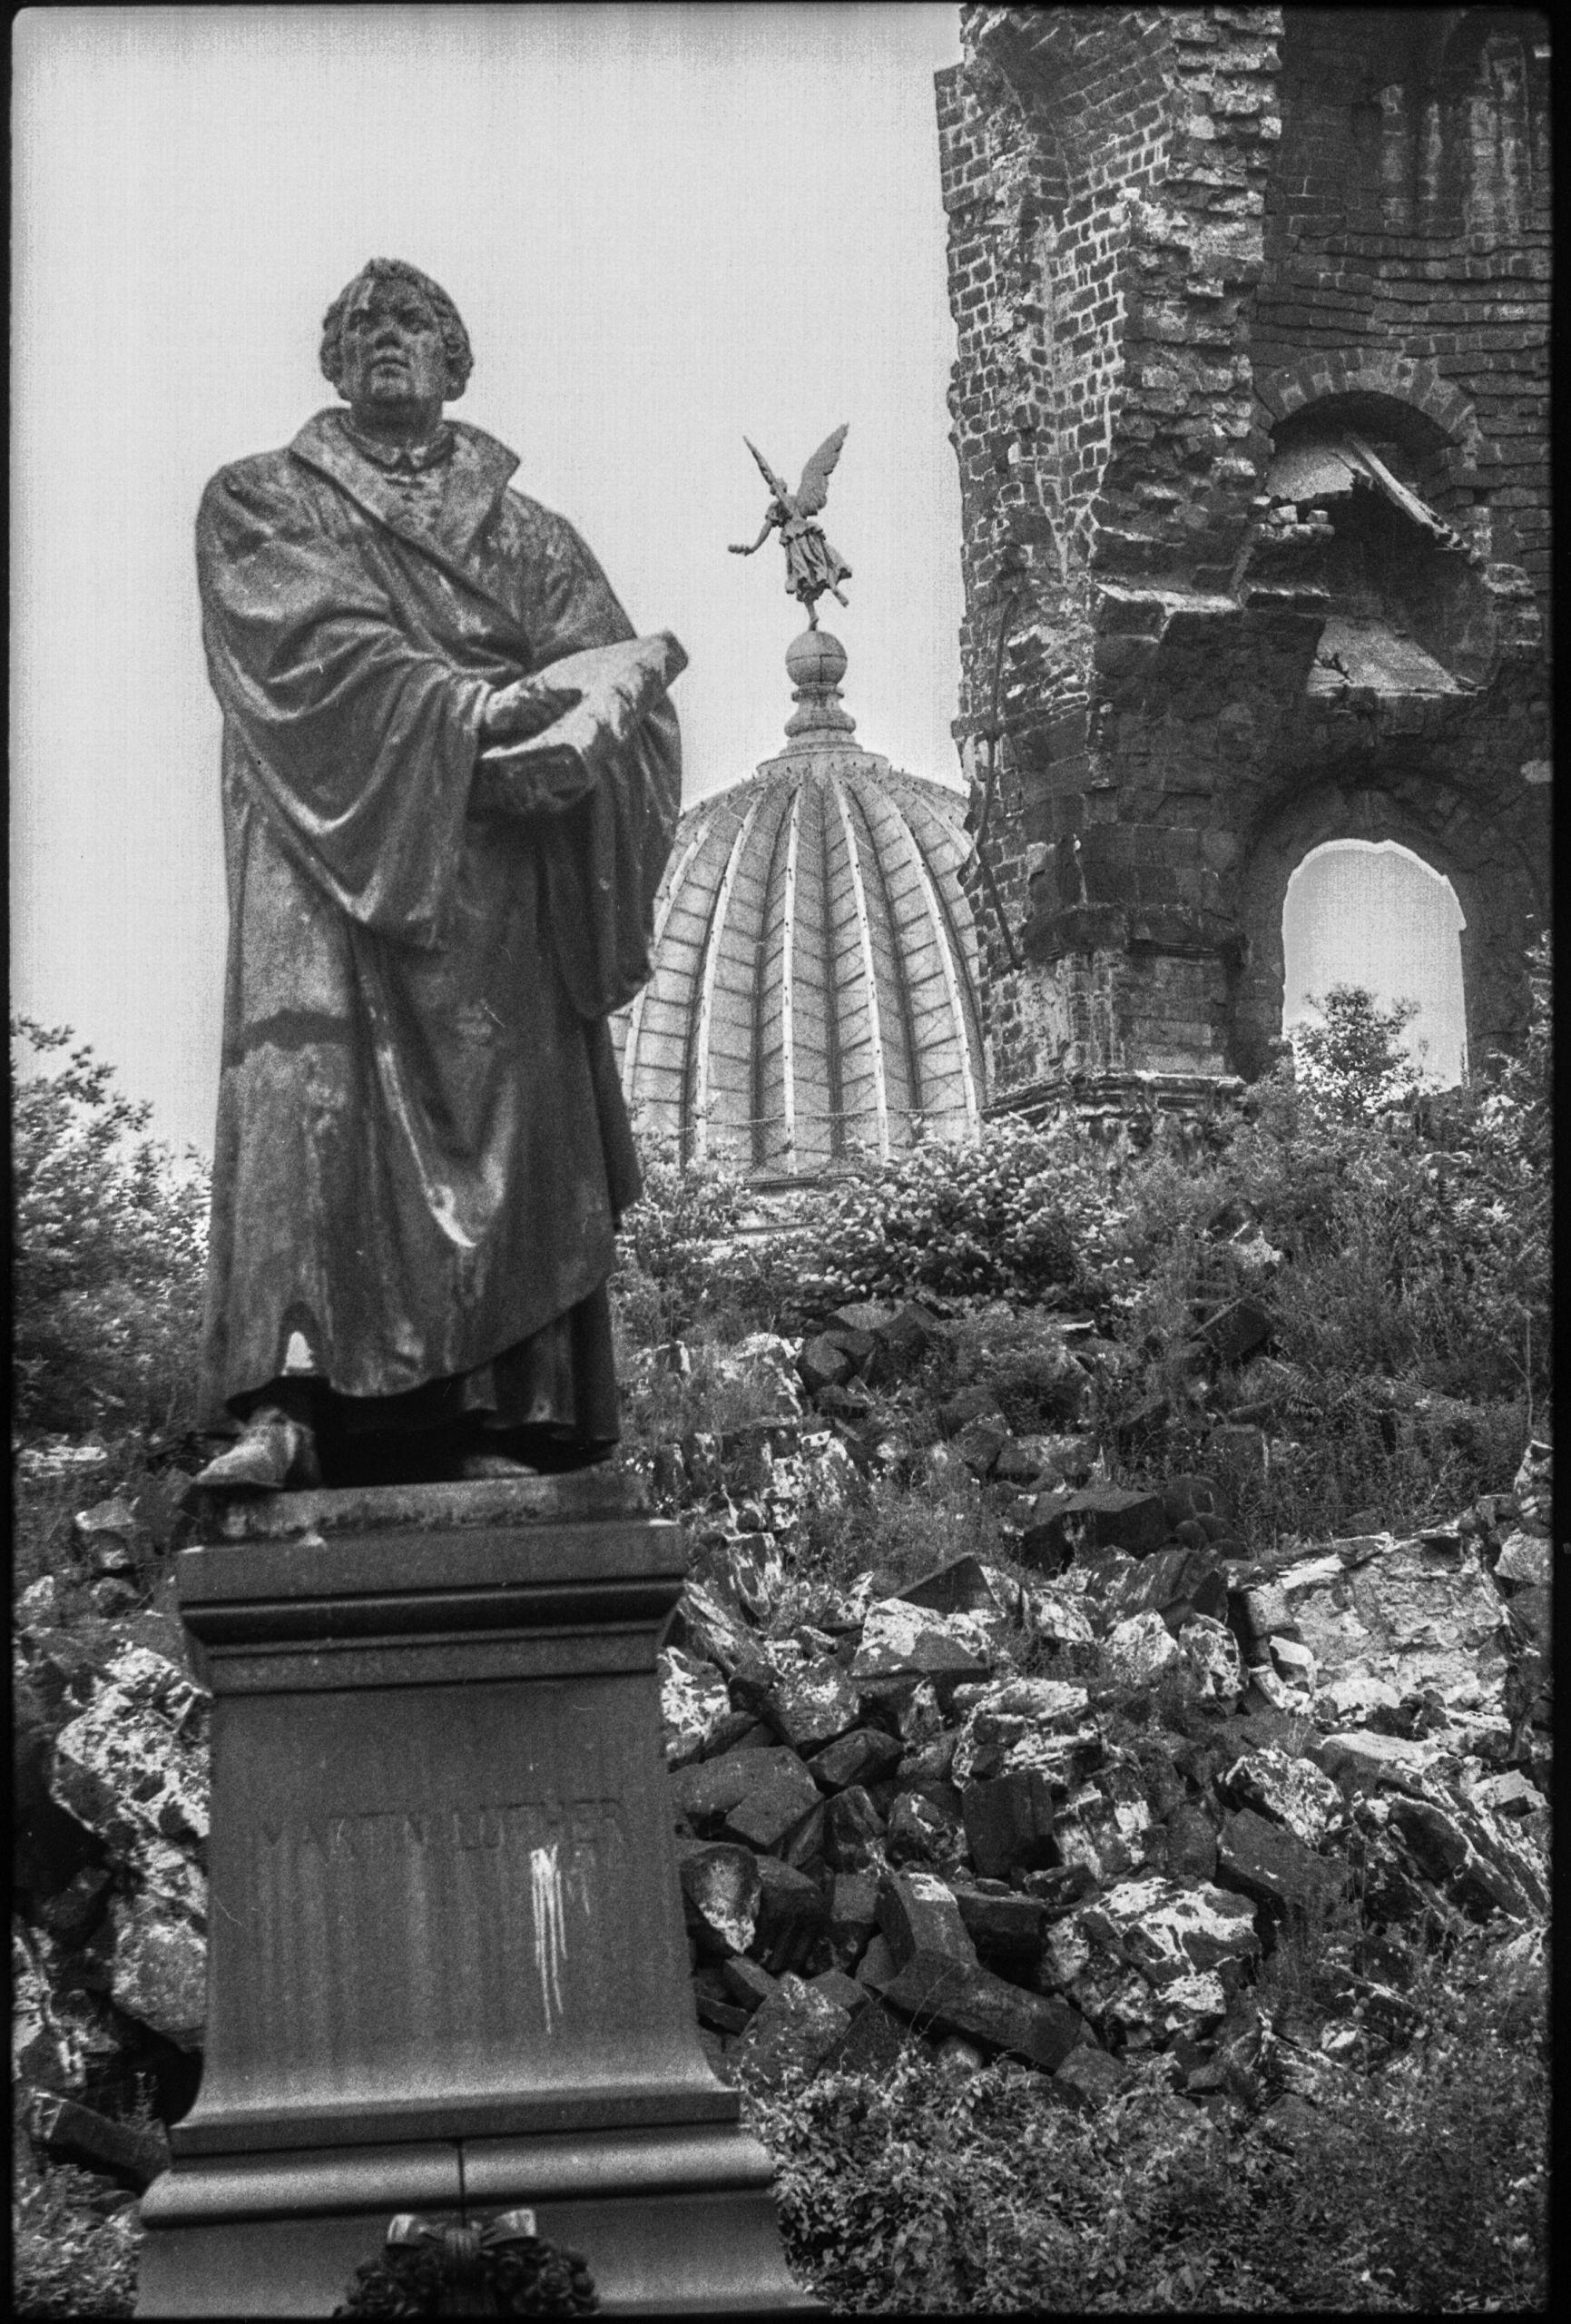 Botanischer Garten Dresden Luxus File Dresden Martin Luther Frauenkirche 1980 Wikimedia